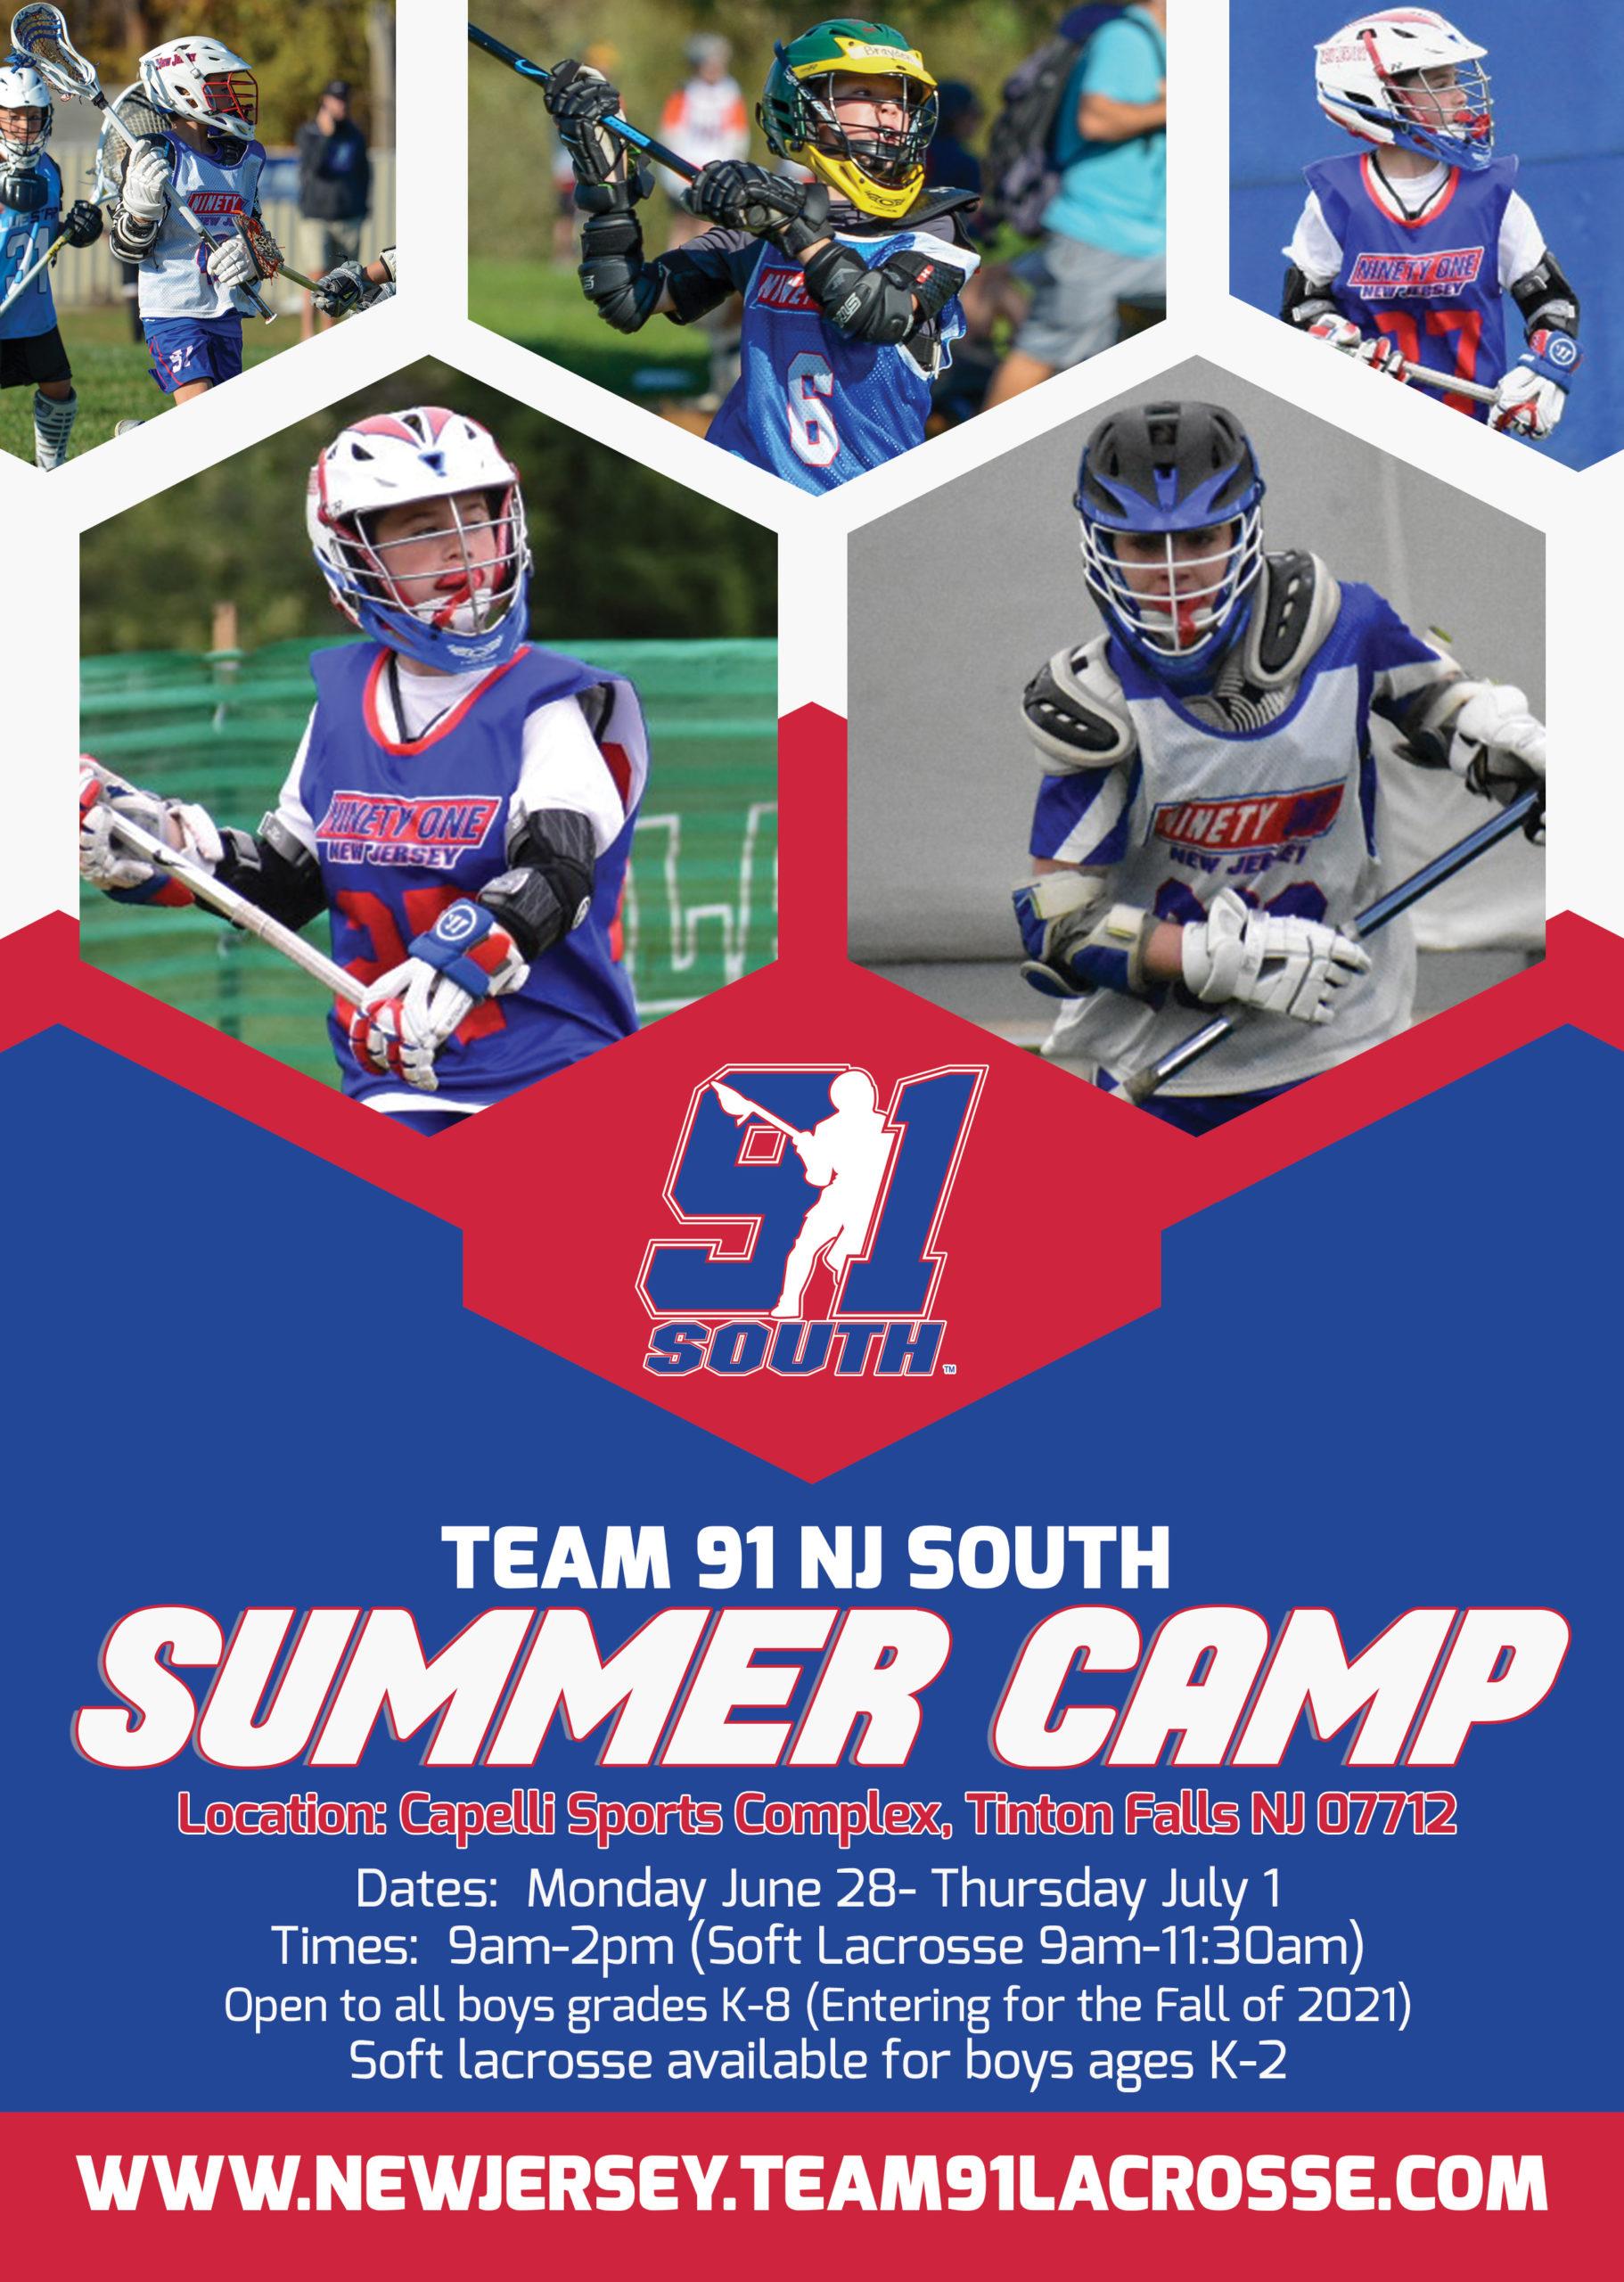 2021-Team91NJSouth-SummerCamp